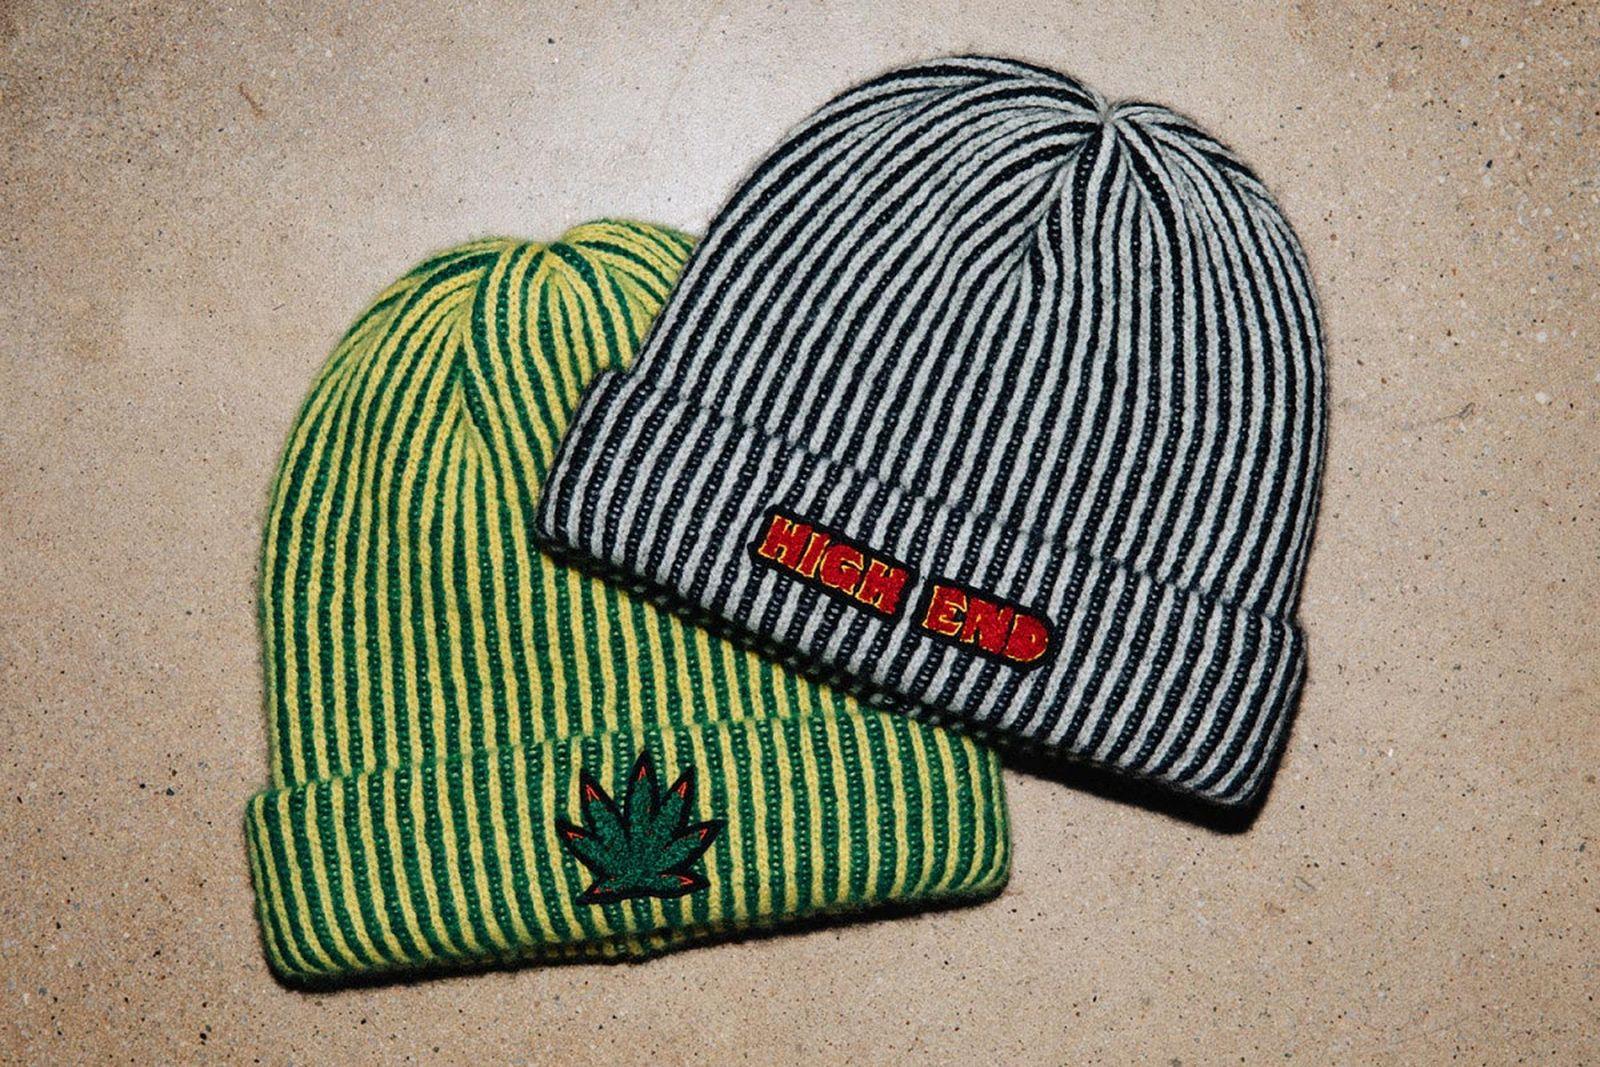 weed business ideas guide marijuana